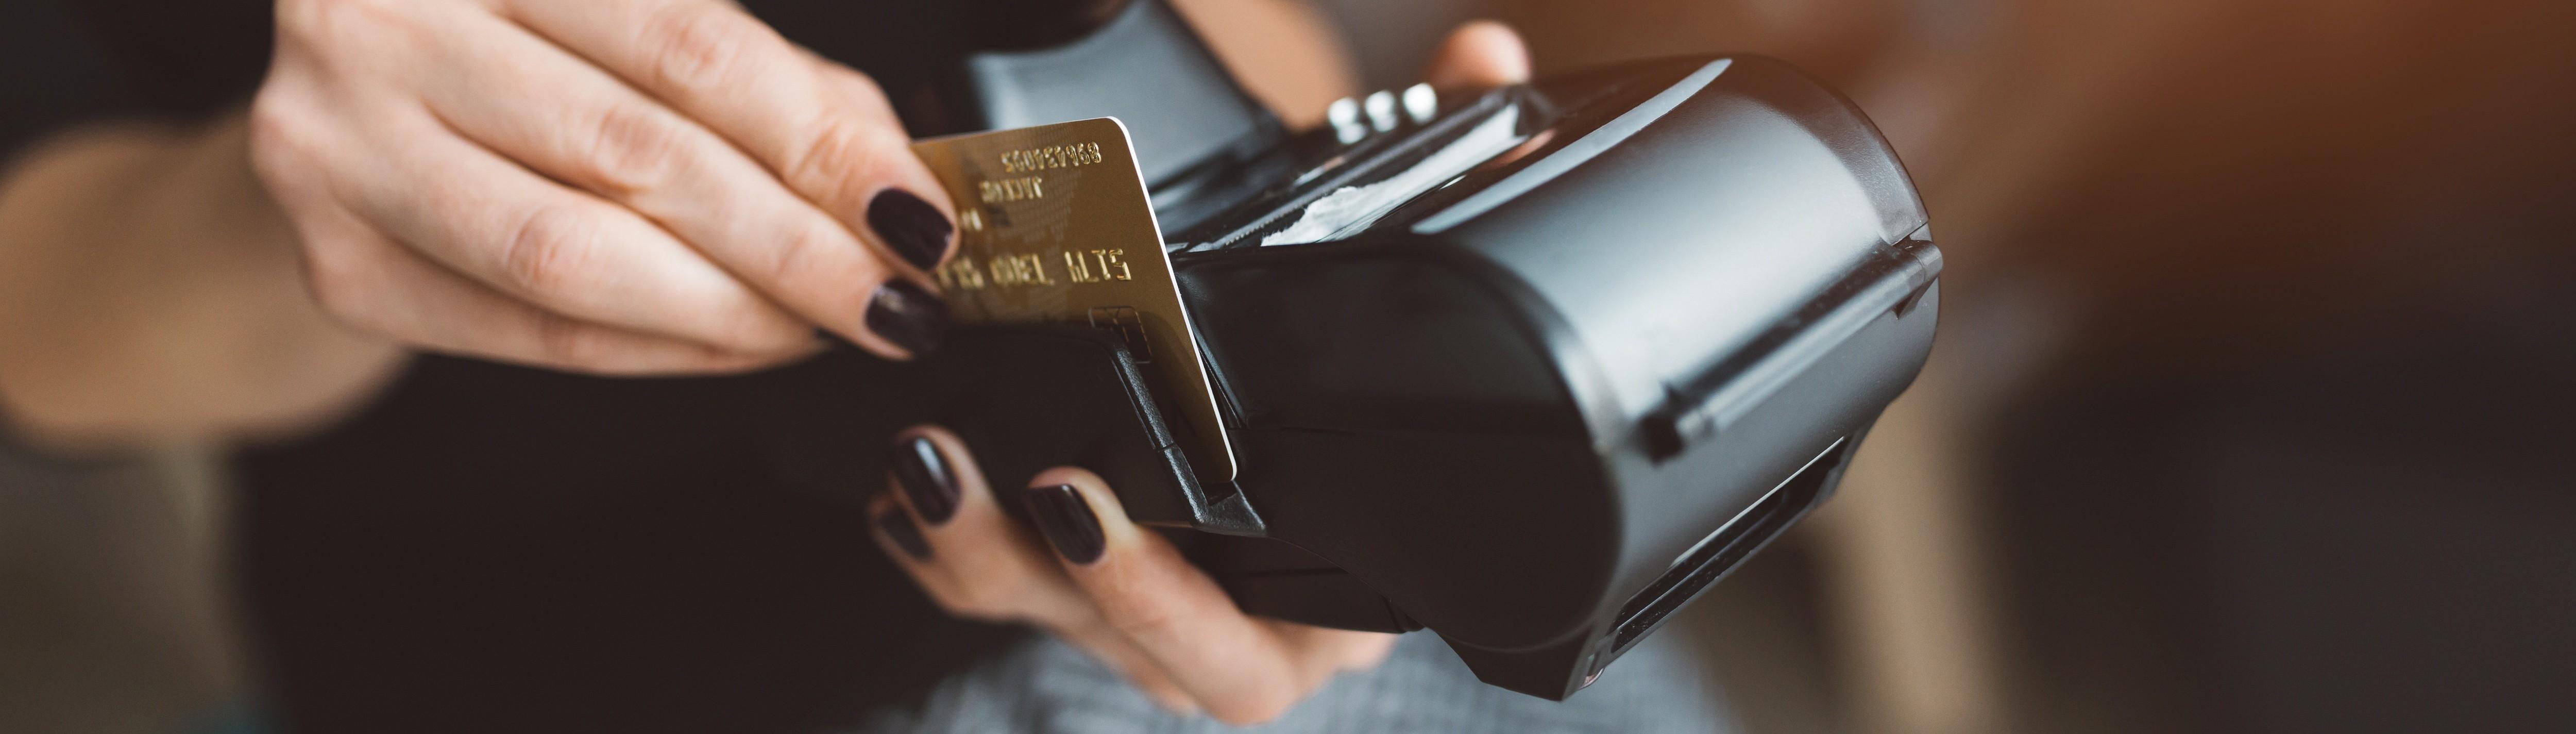 Custom Credit Card Processing Inc Linkedin